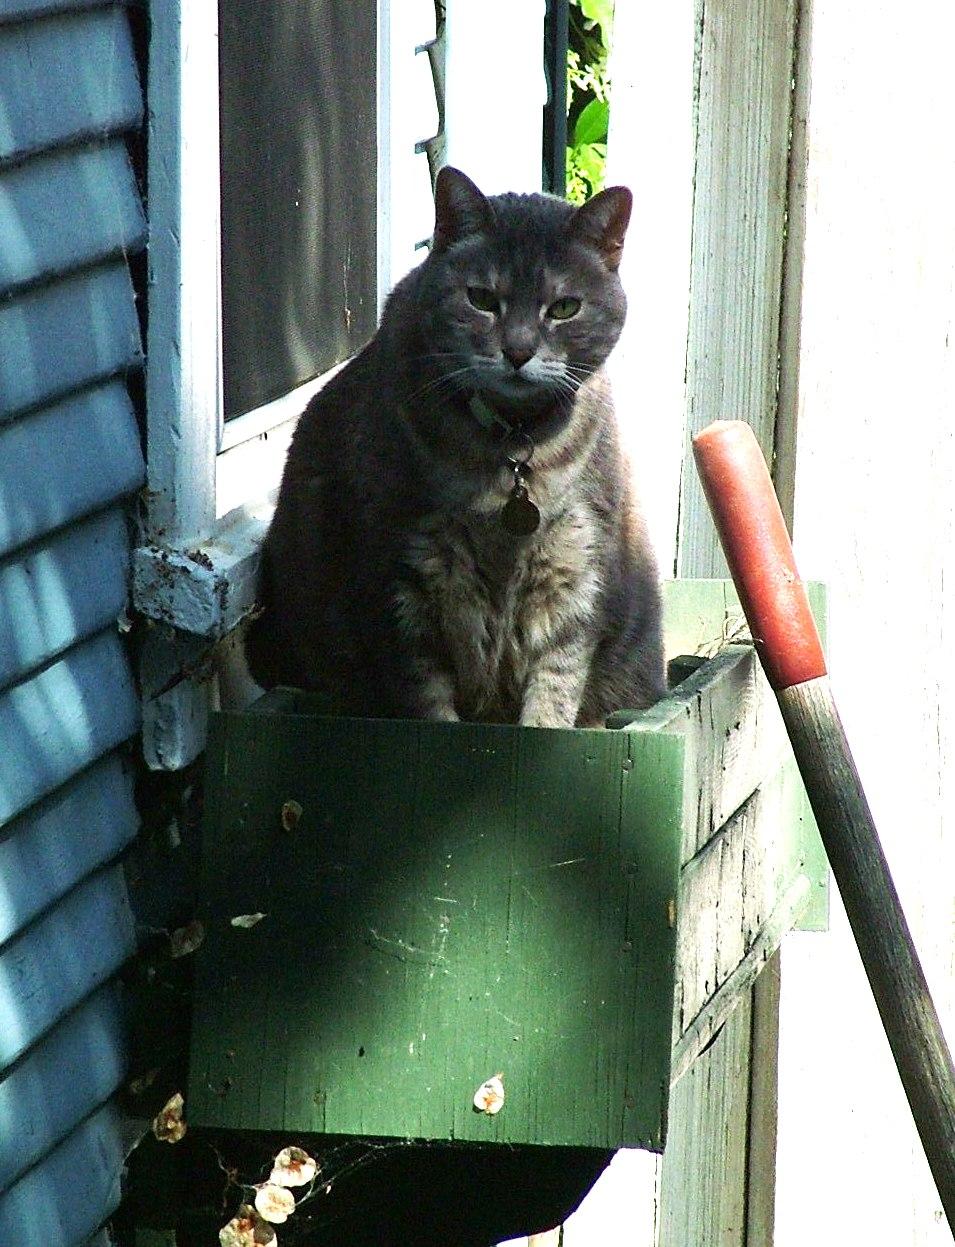 4.30.09, Sweetpea in the side yard window box